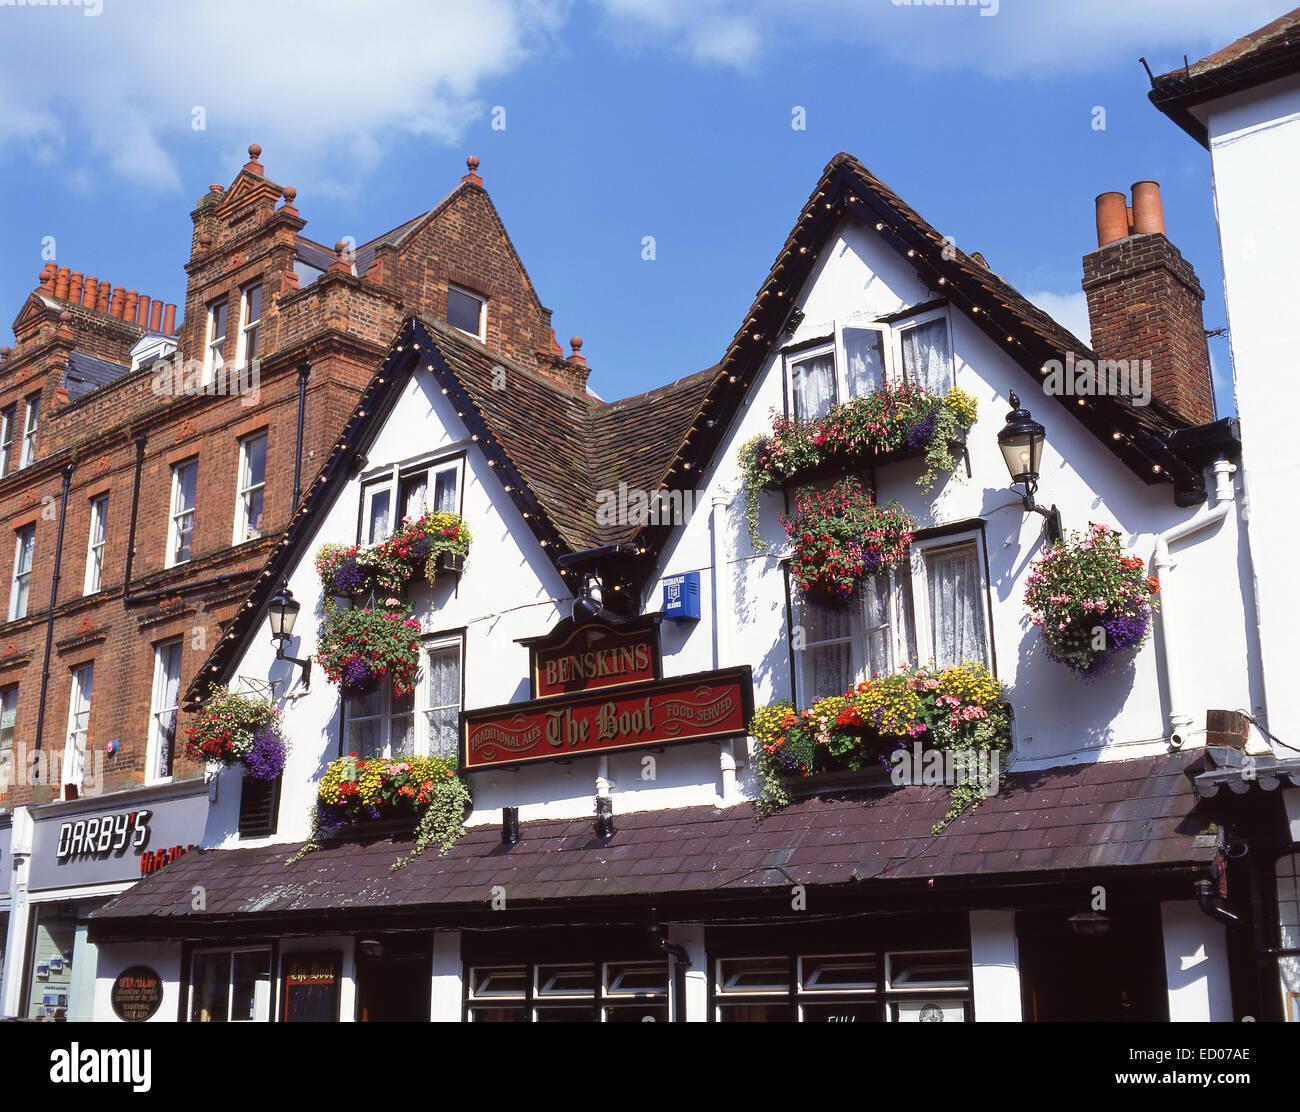 15th century The Boot Pub, Market Place, St.Albans, Hertfordshire, England, United Kingdom - Stock Image